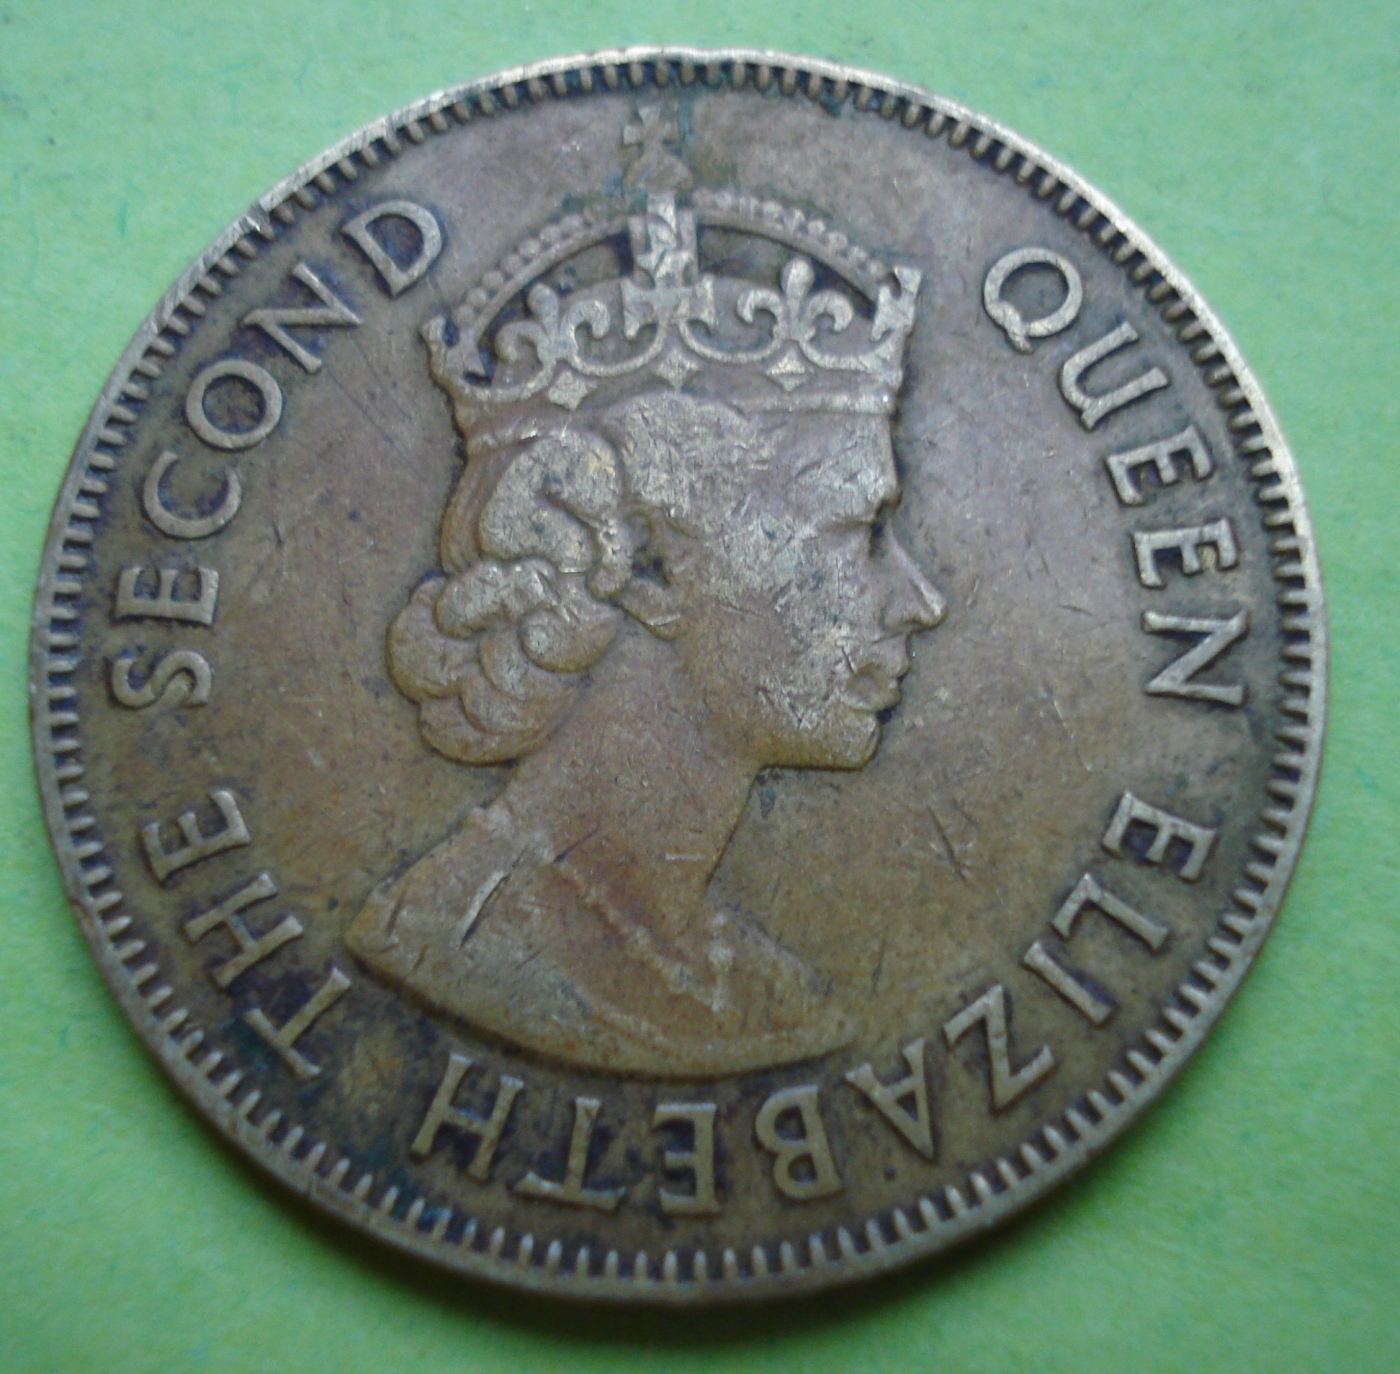 English To Italian Translator Google: 1 Penny 1955, British Colony (1941-1962)